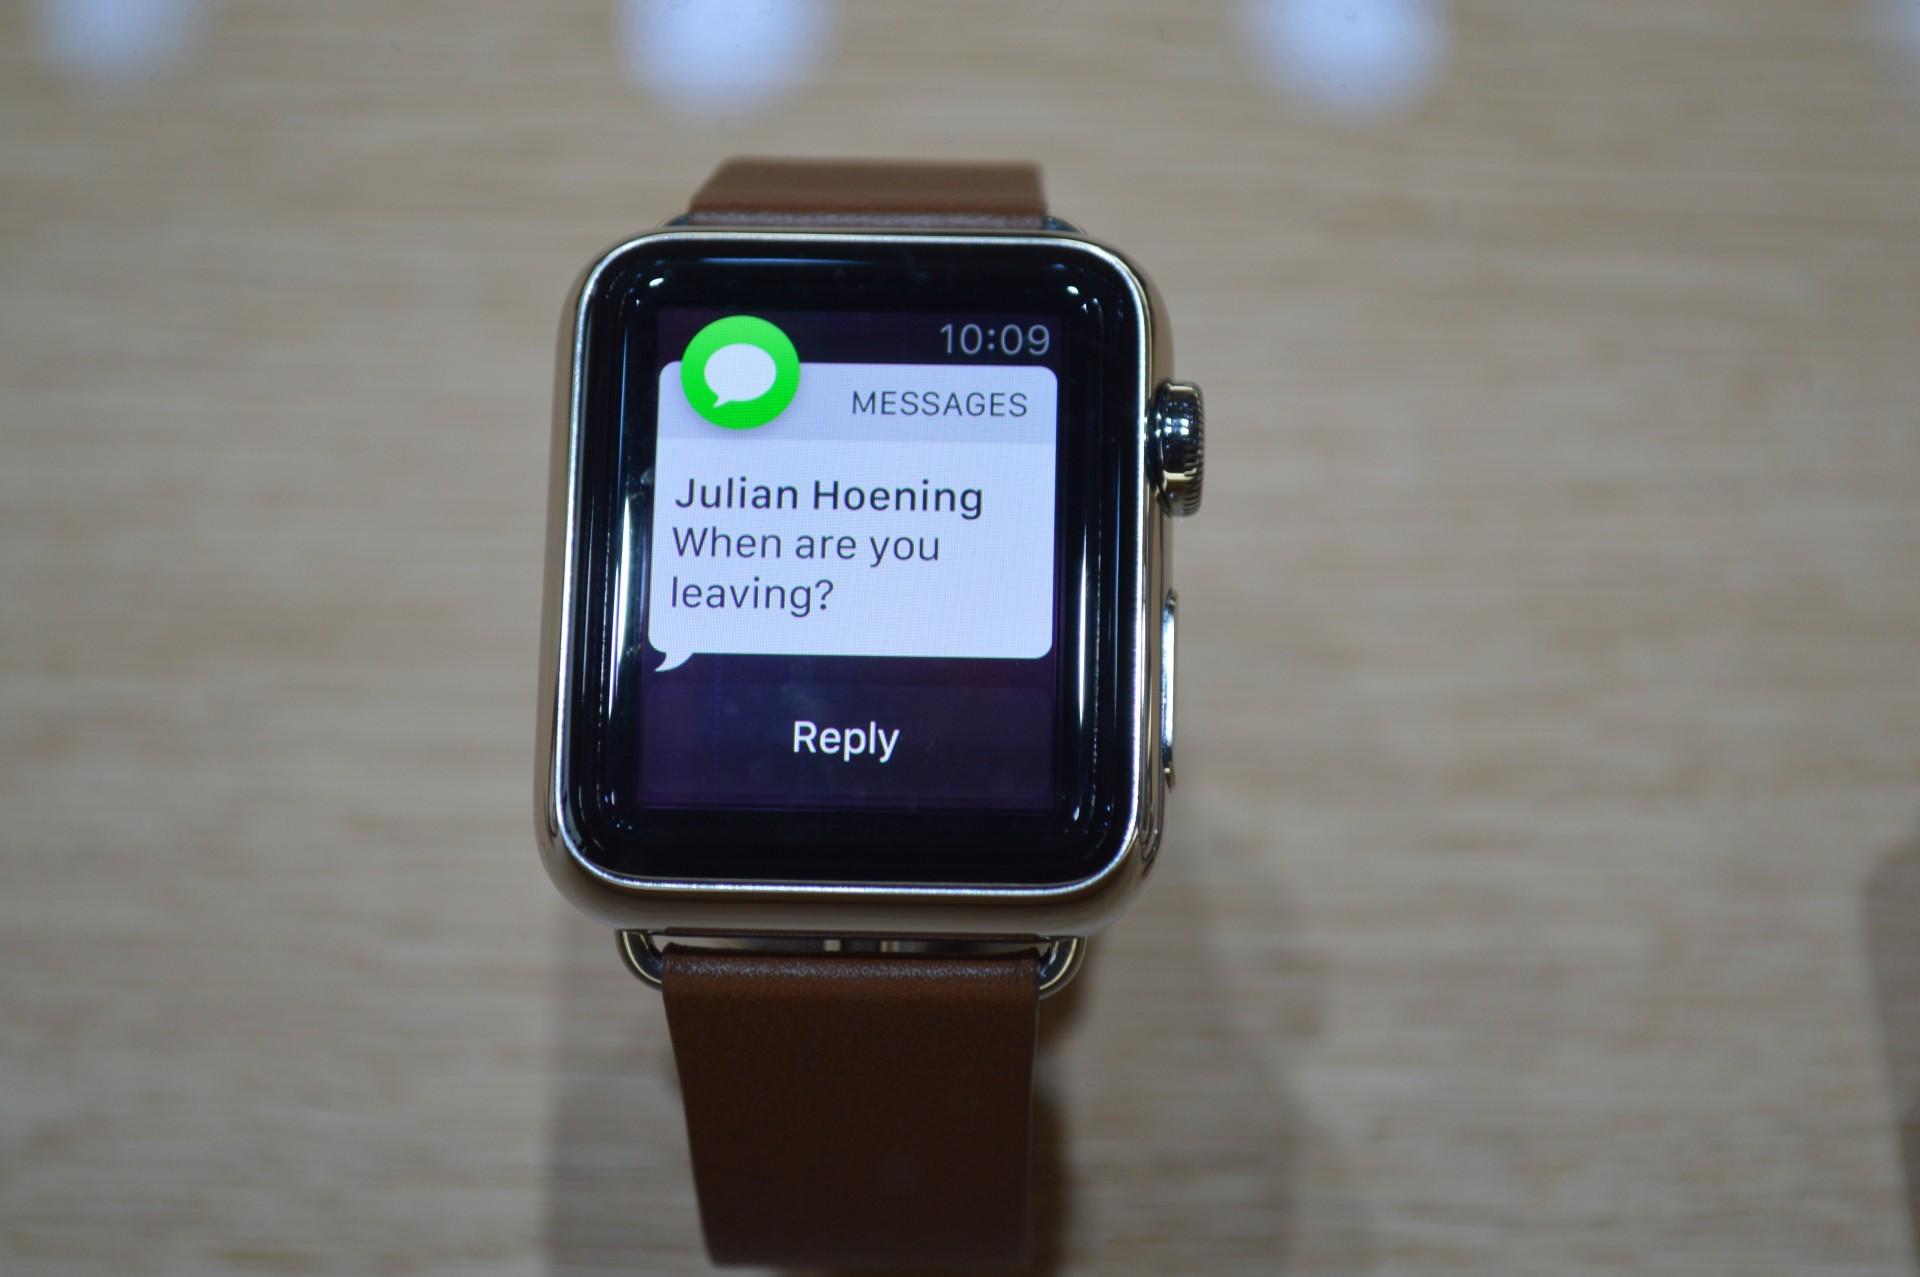 Спрос на Apple Watch в США — 15 млн устройств